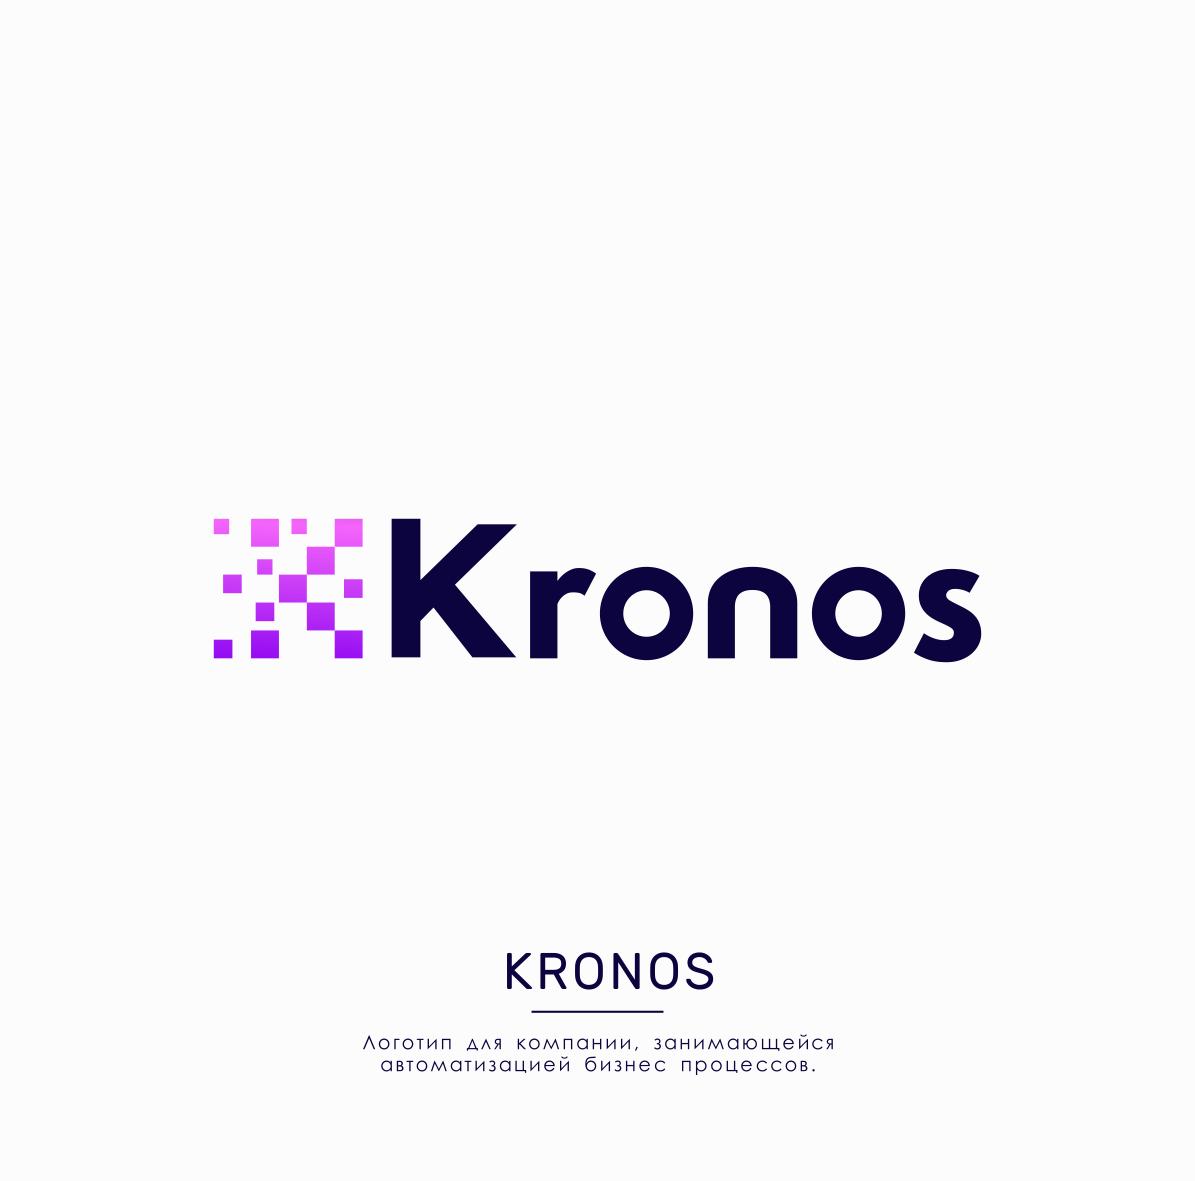 Разработать логотип KRONOS фото f_4575fb216d8d108b.png